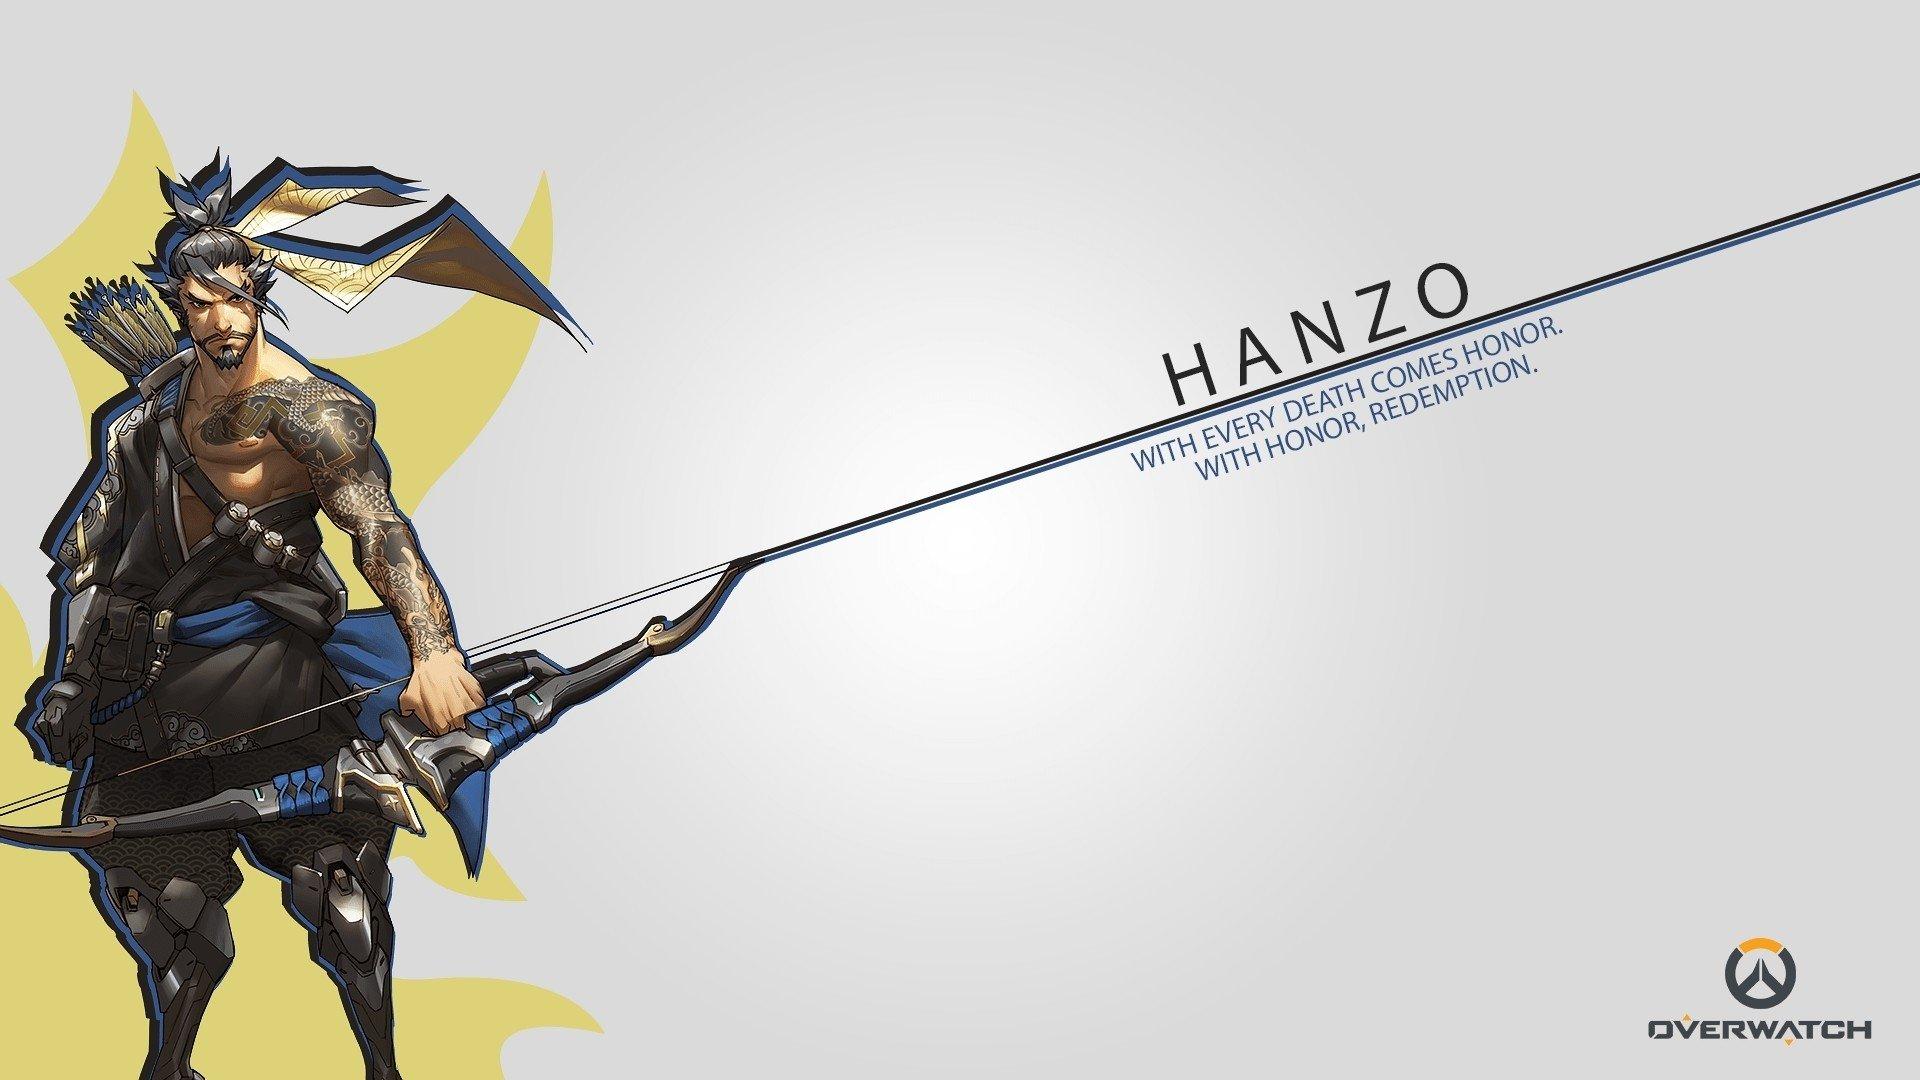 Overwatch Dual Screen Wallpaper: Hanzo HD Wallpaper